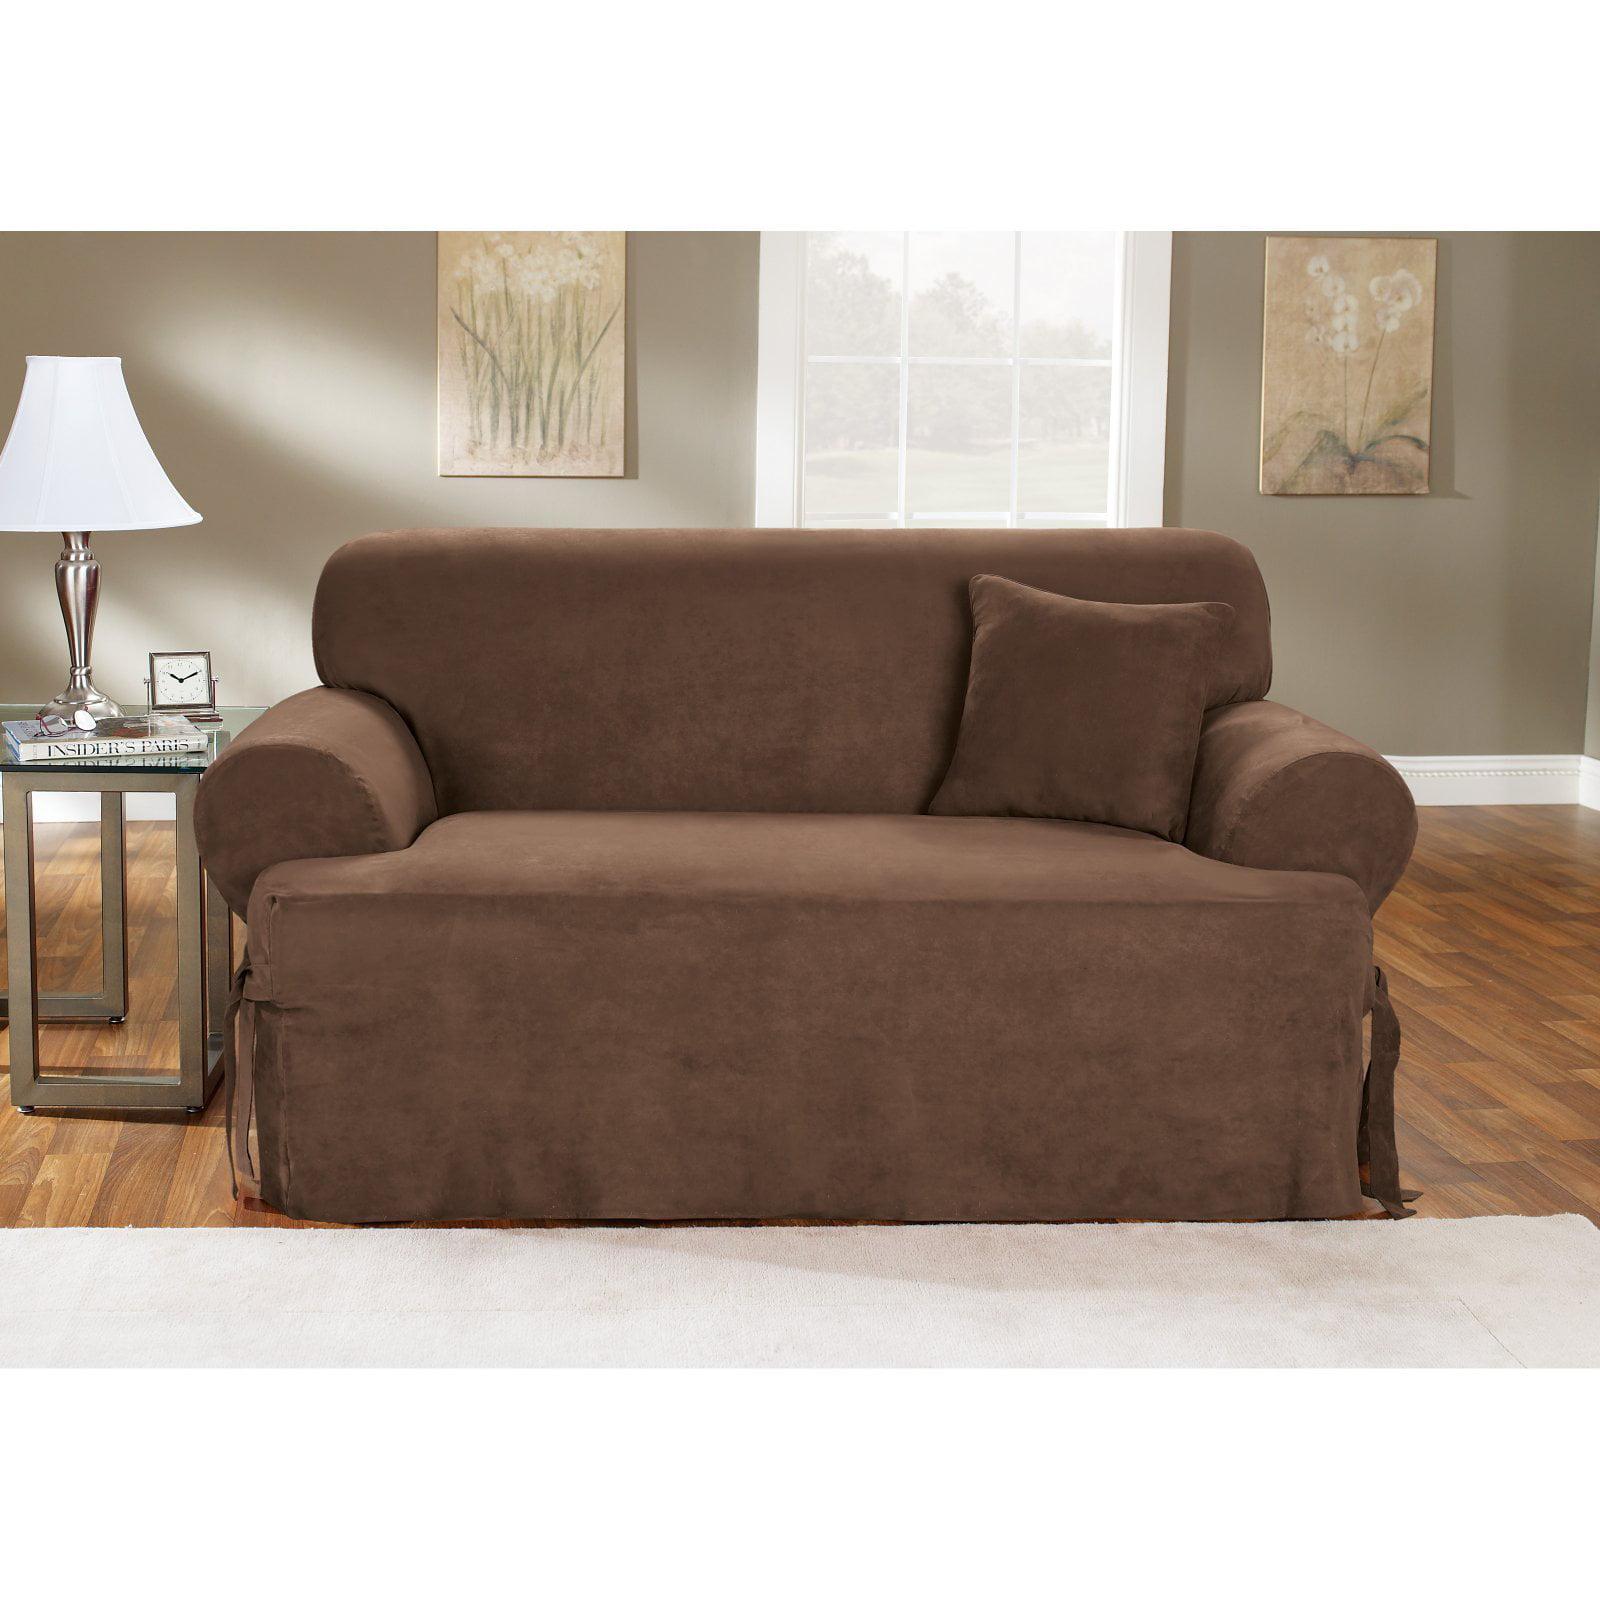 Sure Fit 1pc Soft Suede T Cushion Sofa Slipcover Cream Walmart